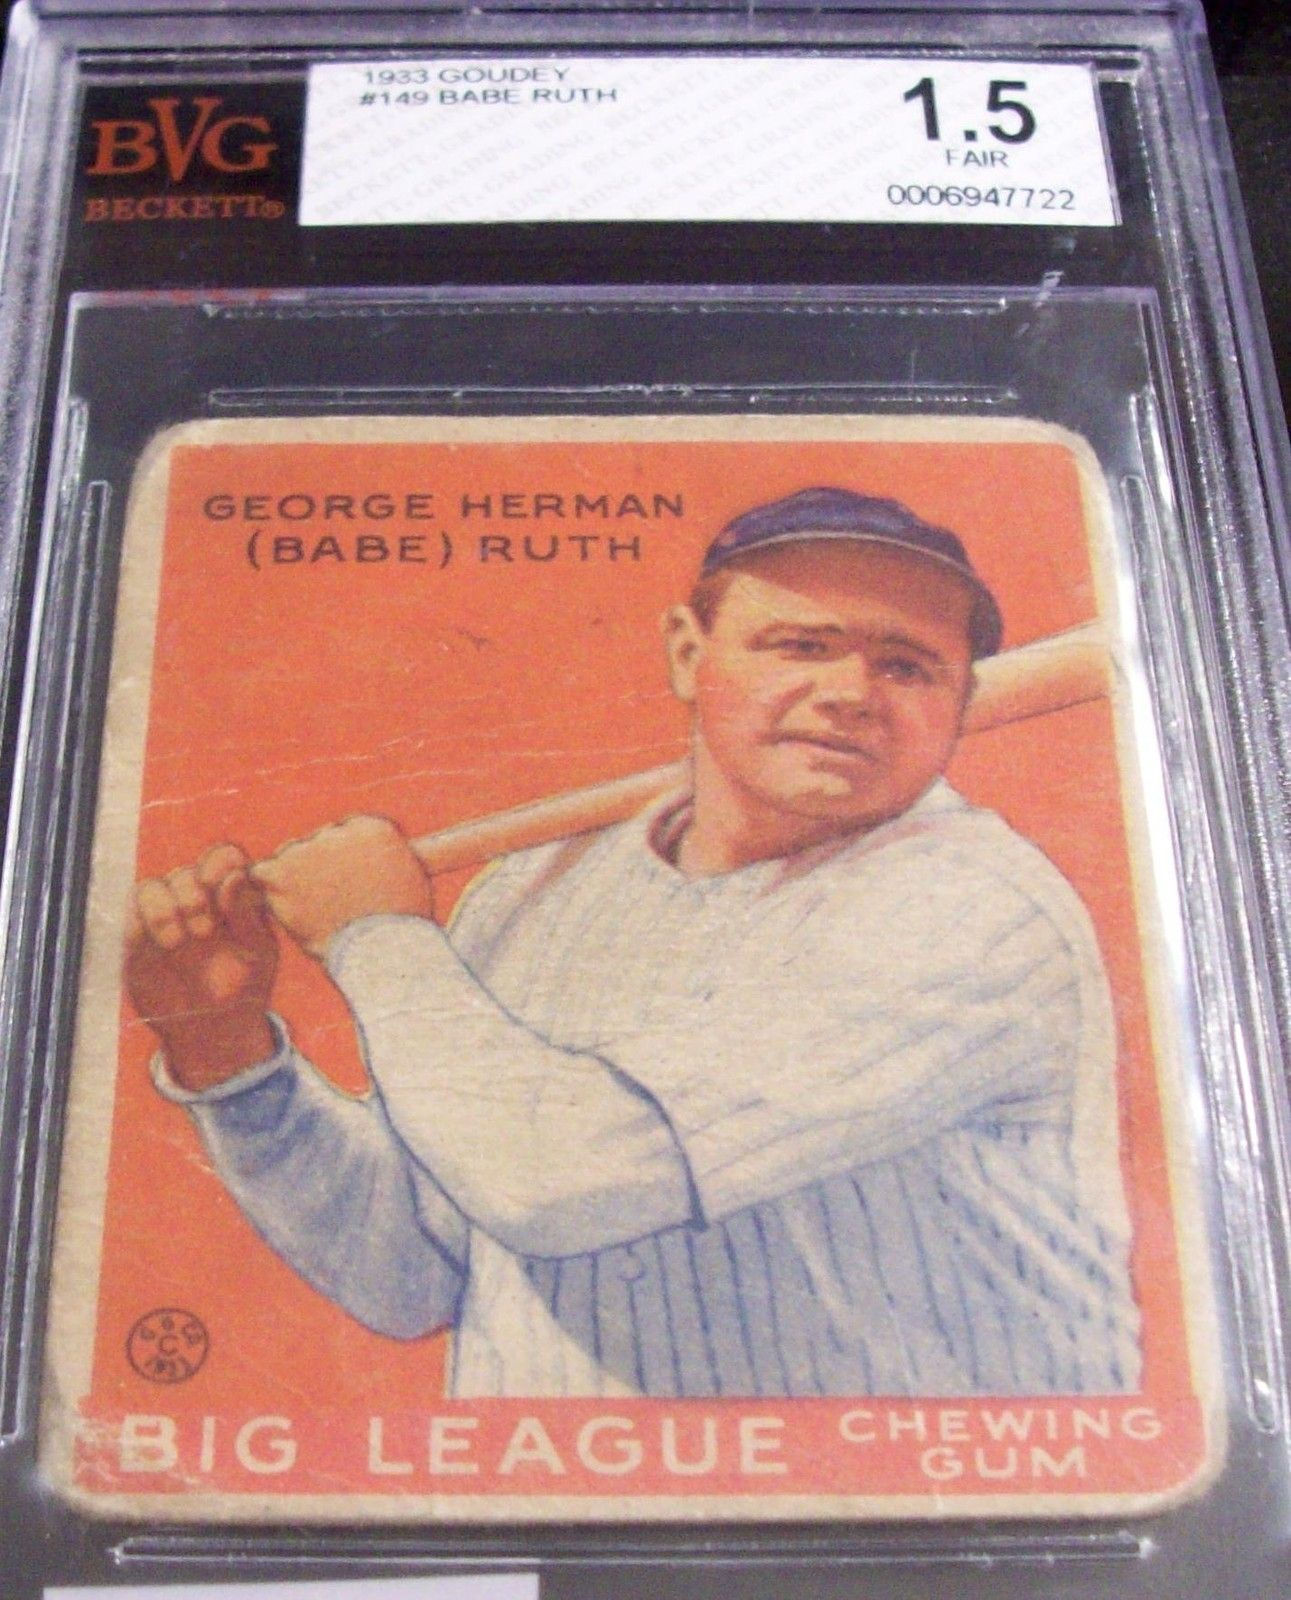 Babe ruth 1933 goudey baseball card 149 beckett bvg grade